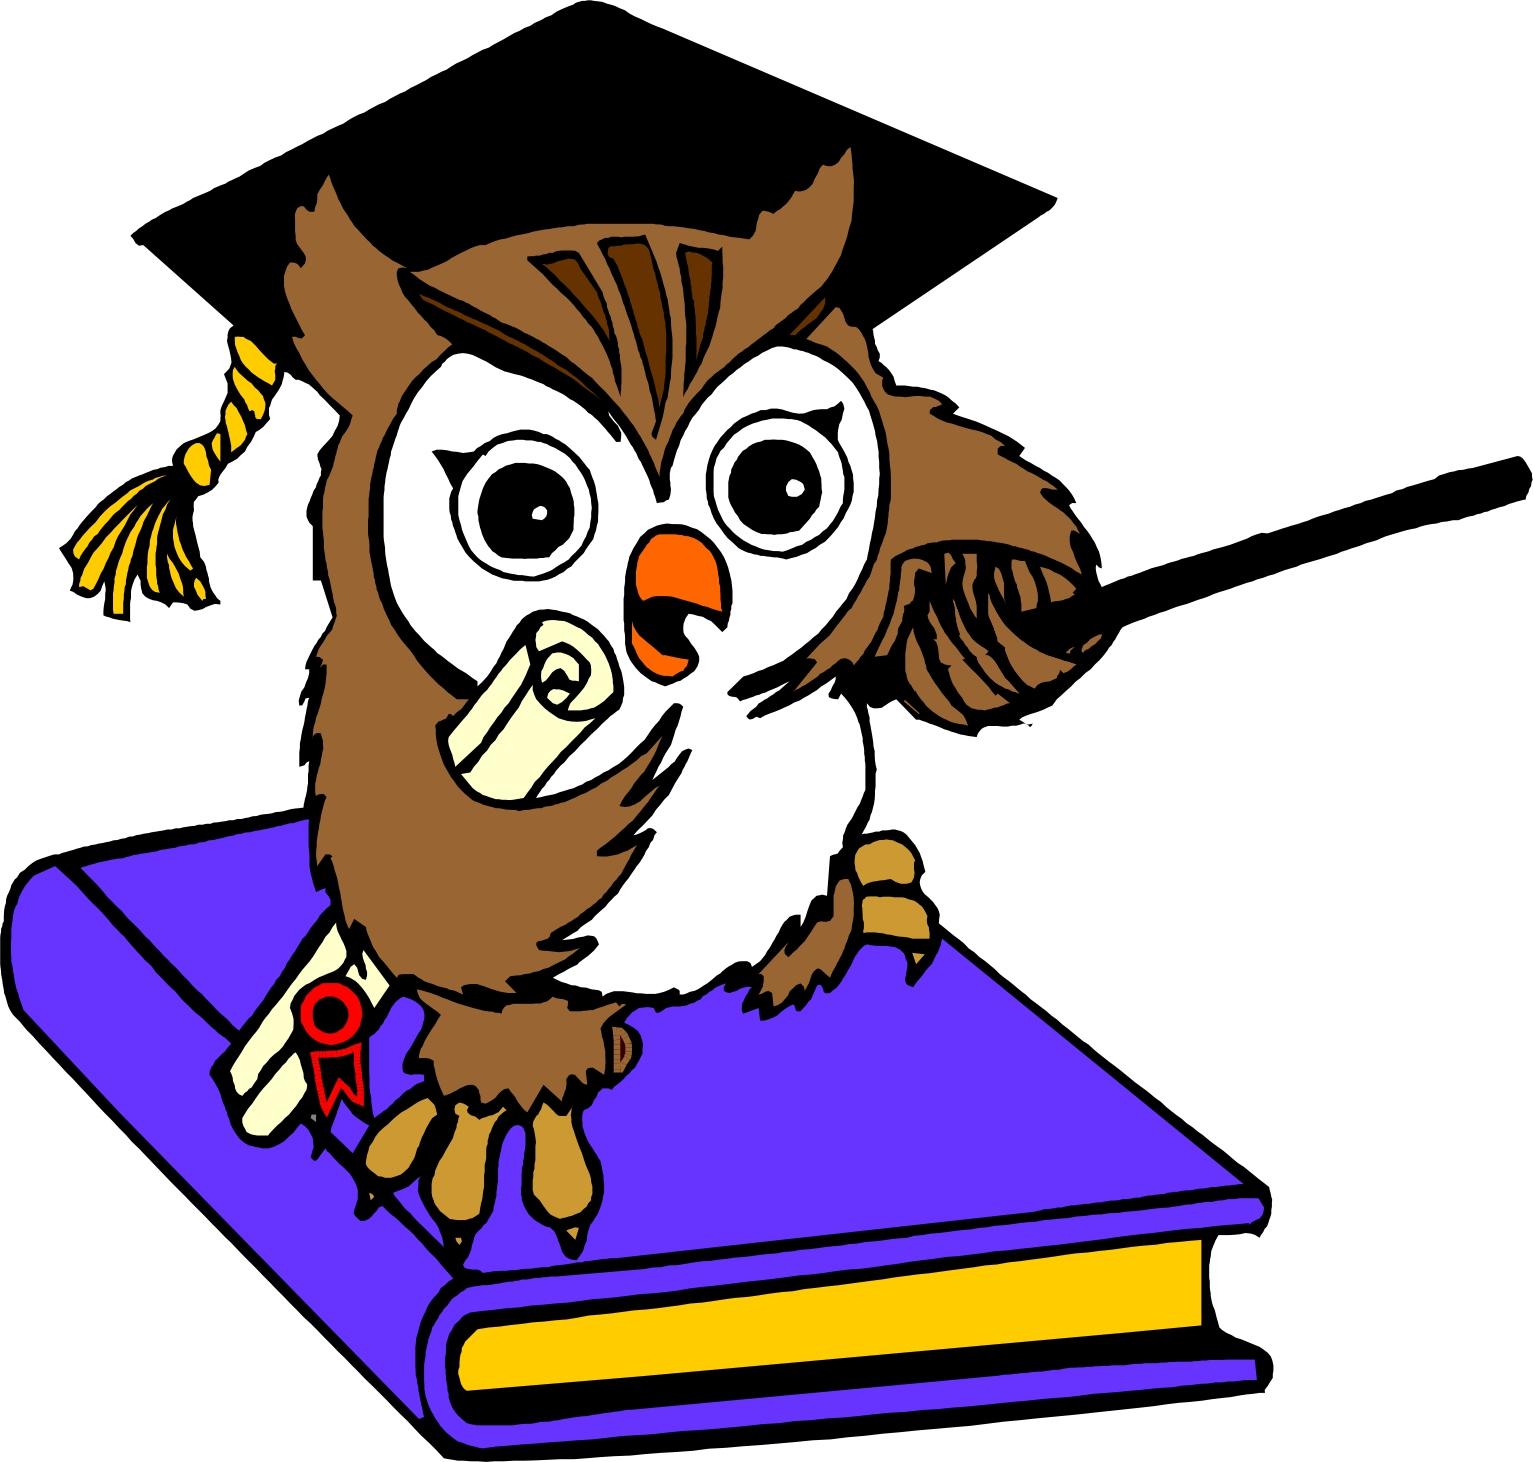 1533x1462 Owl Cartoon Clip Art Clipart Image